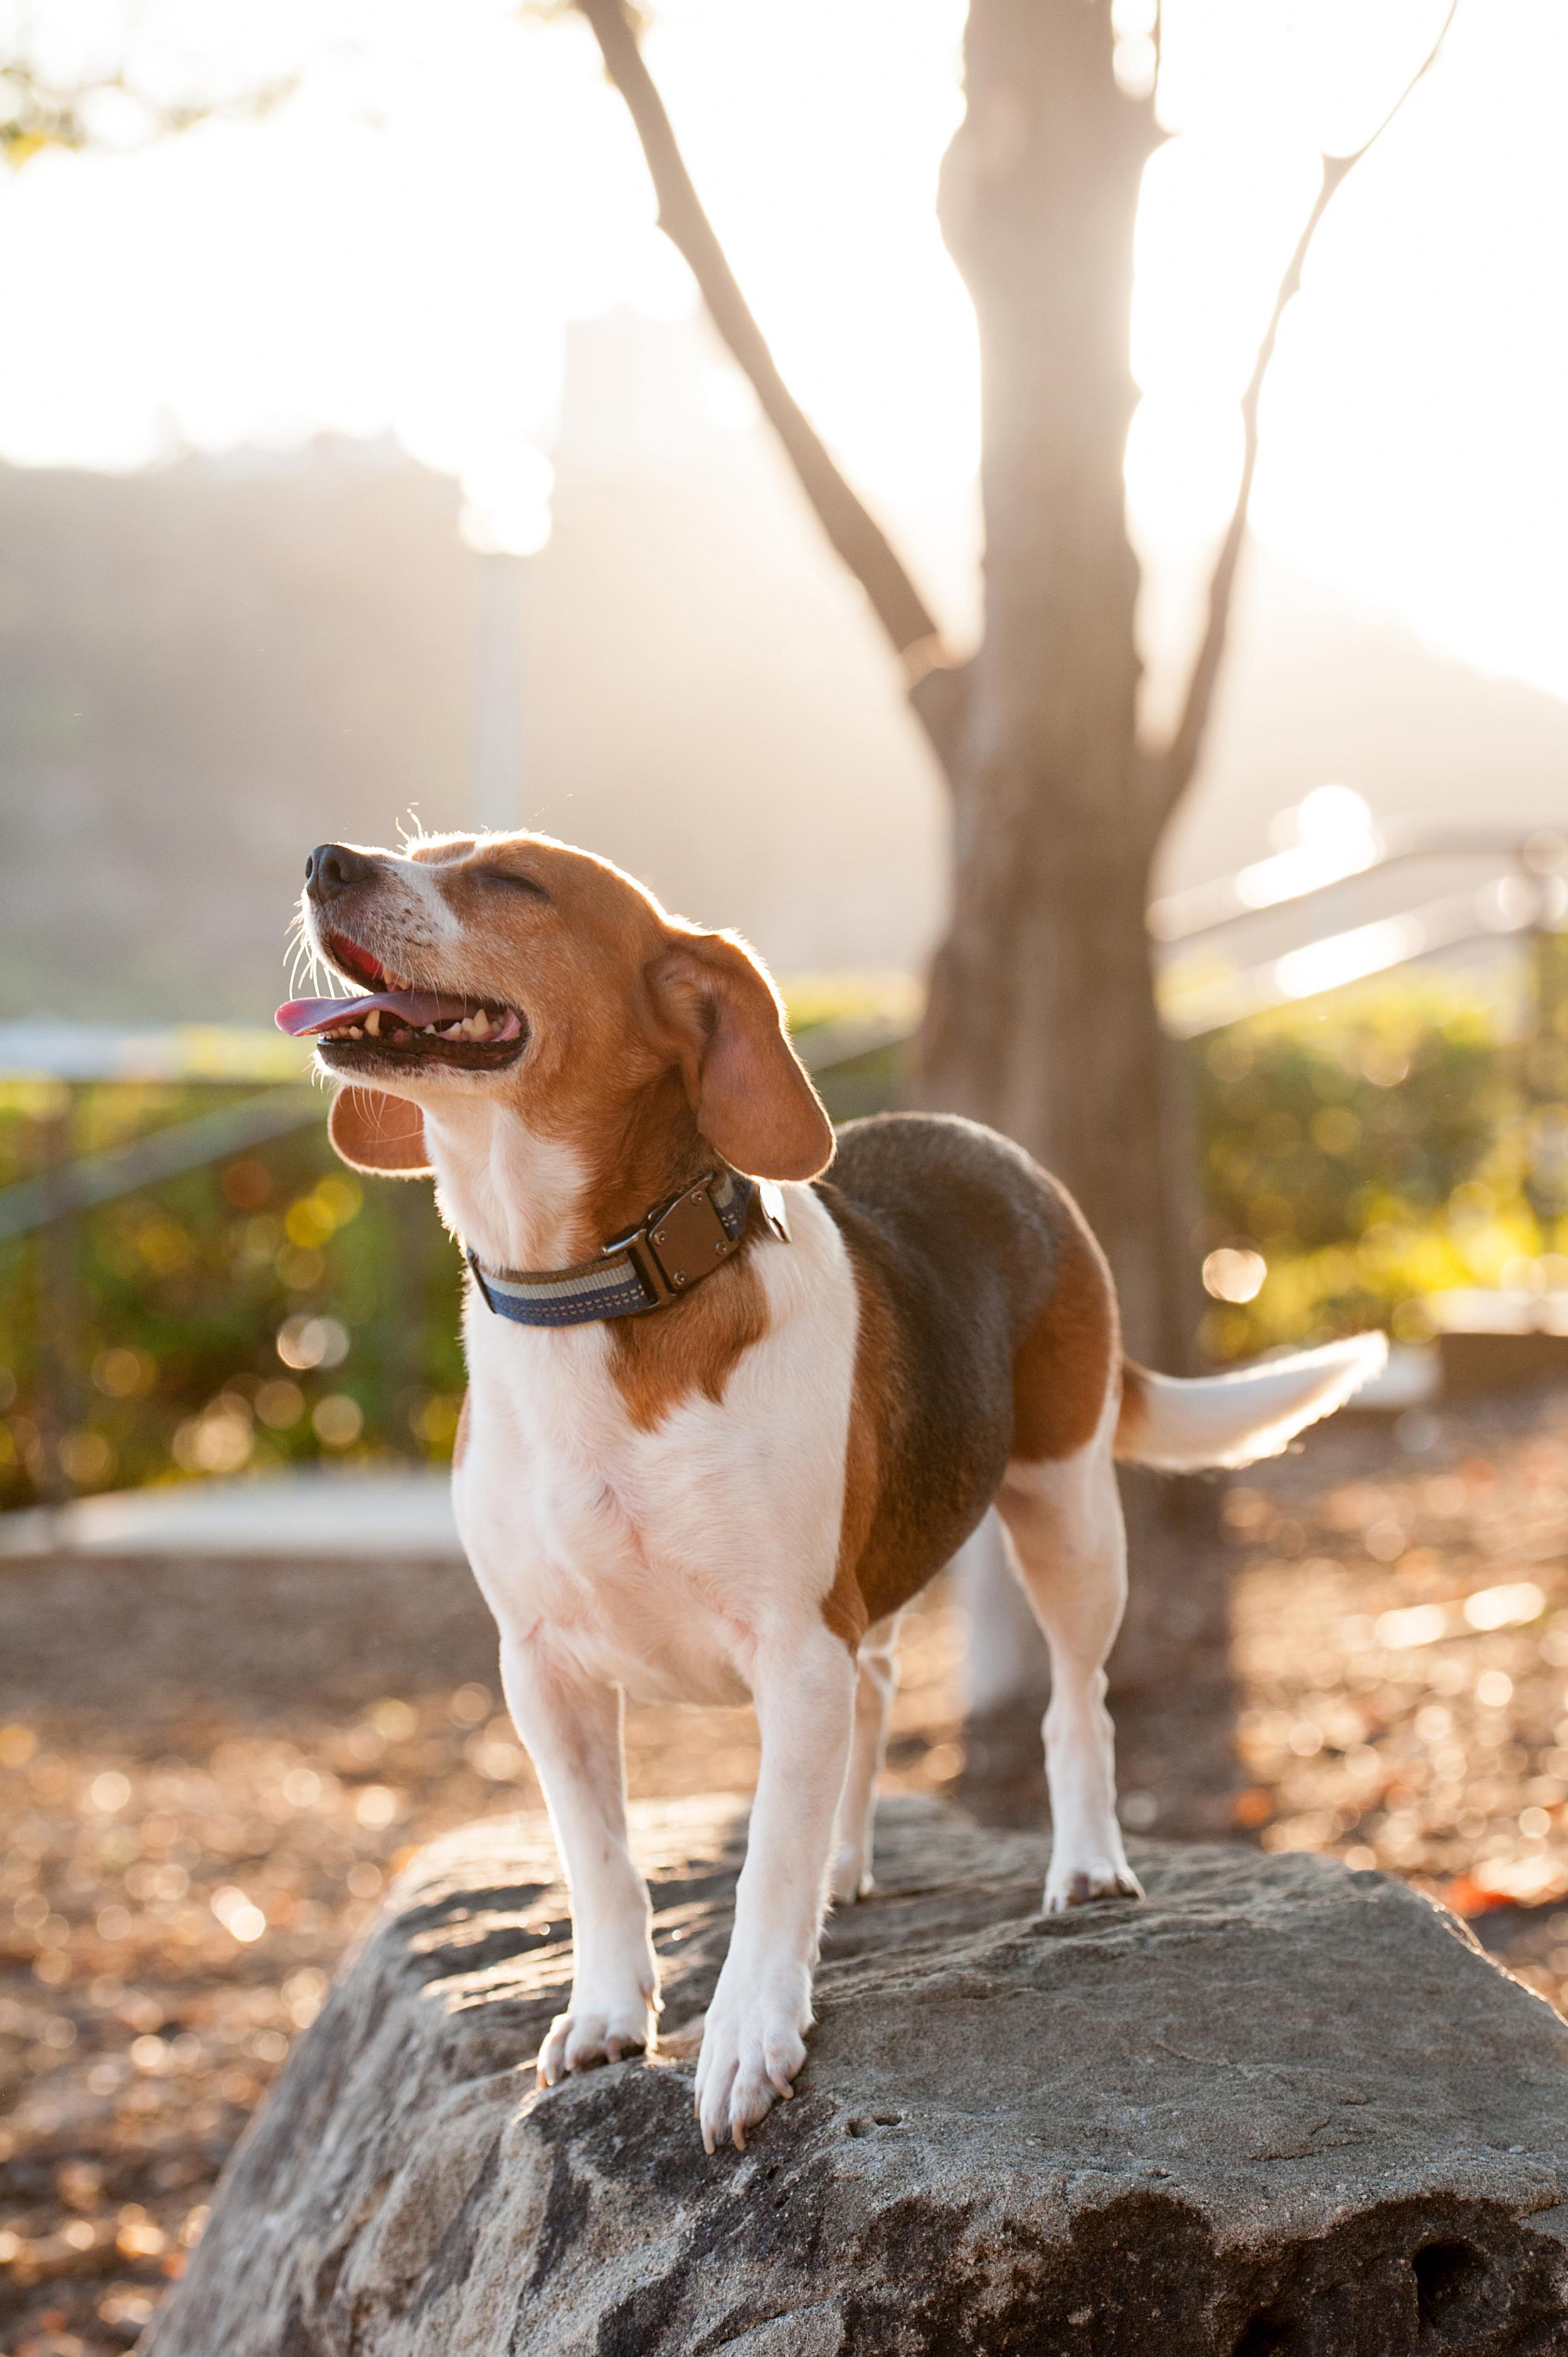 dexter jack-a-bee dog photography pittsburgh 017.jpg